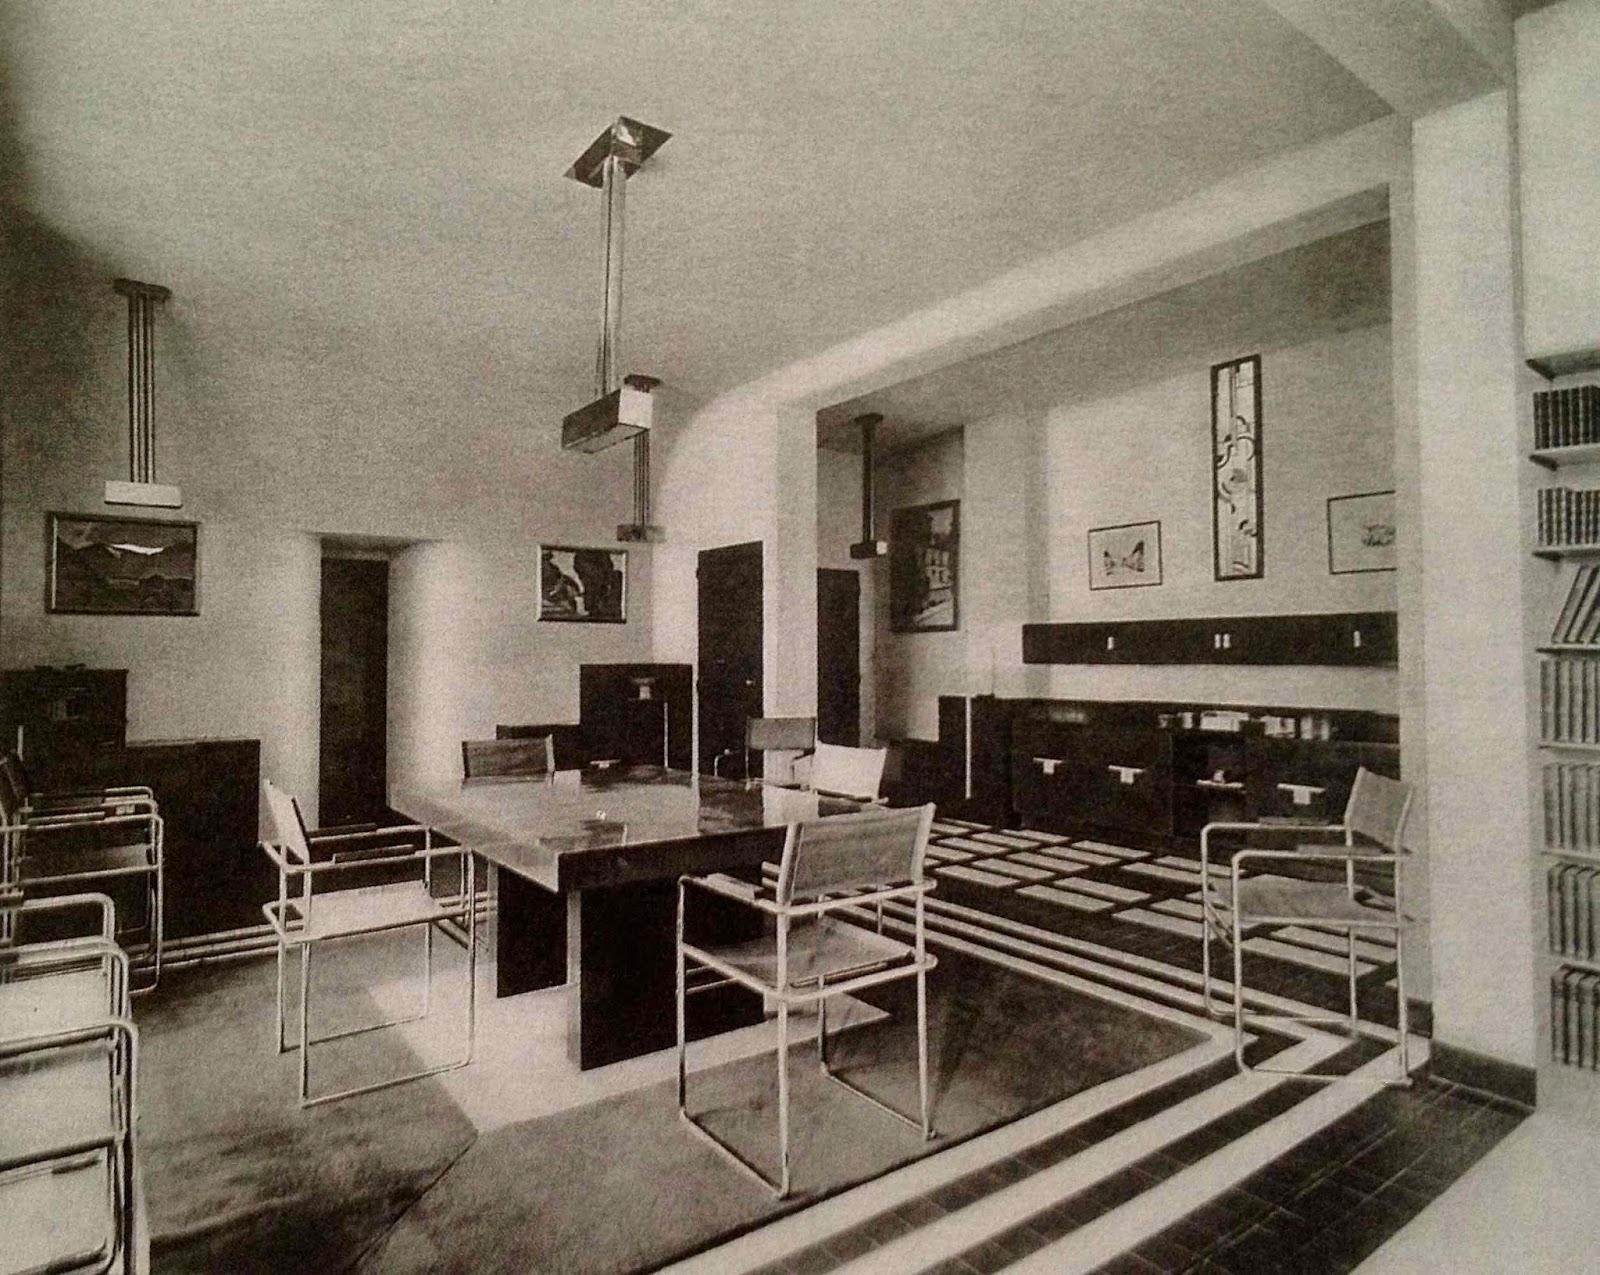 le blog des amis de la villa cavrois la rue mallet stevens. Black Bedroom Furniture Sets. Home Design Ideas